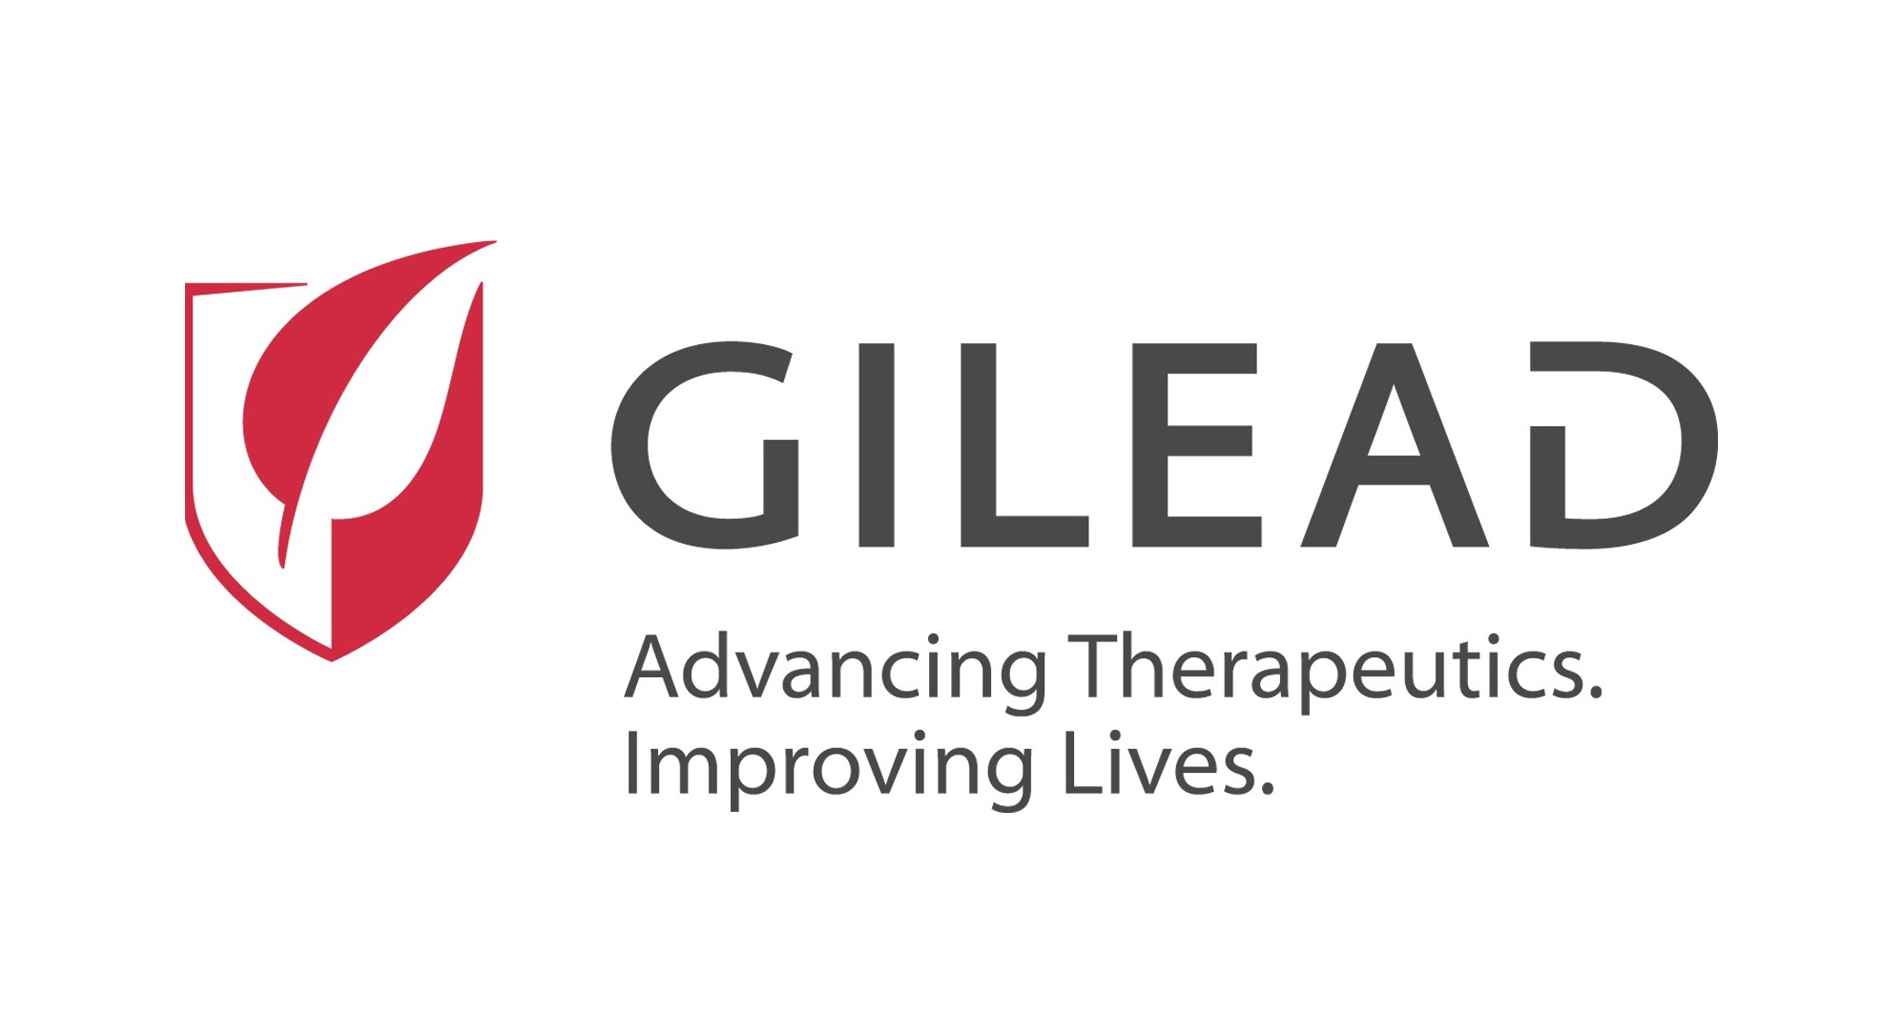 Gilead Sciences (GILD) logo e scritta